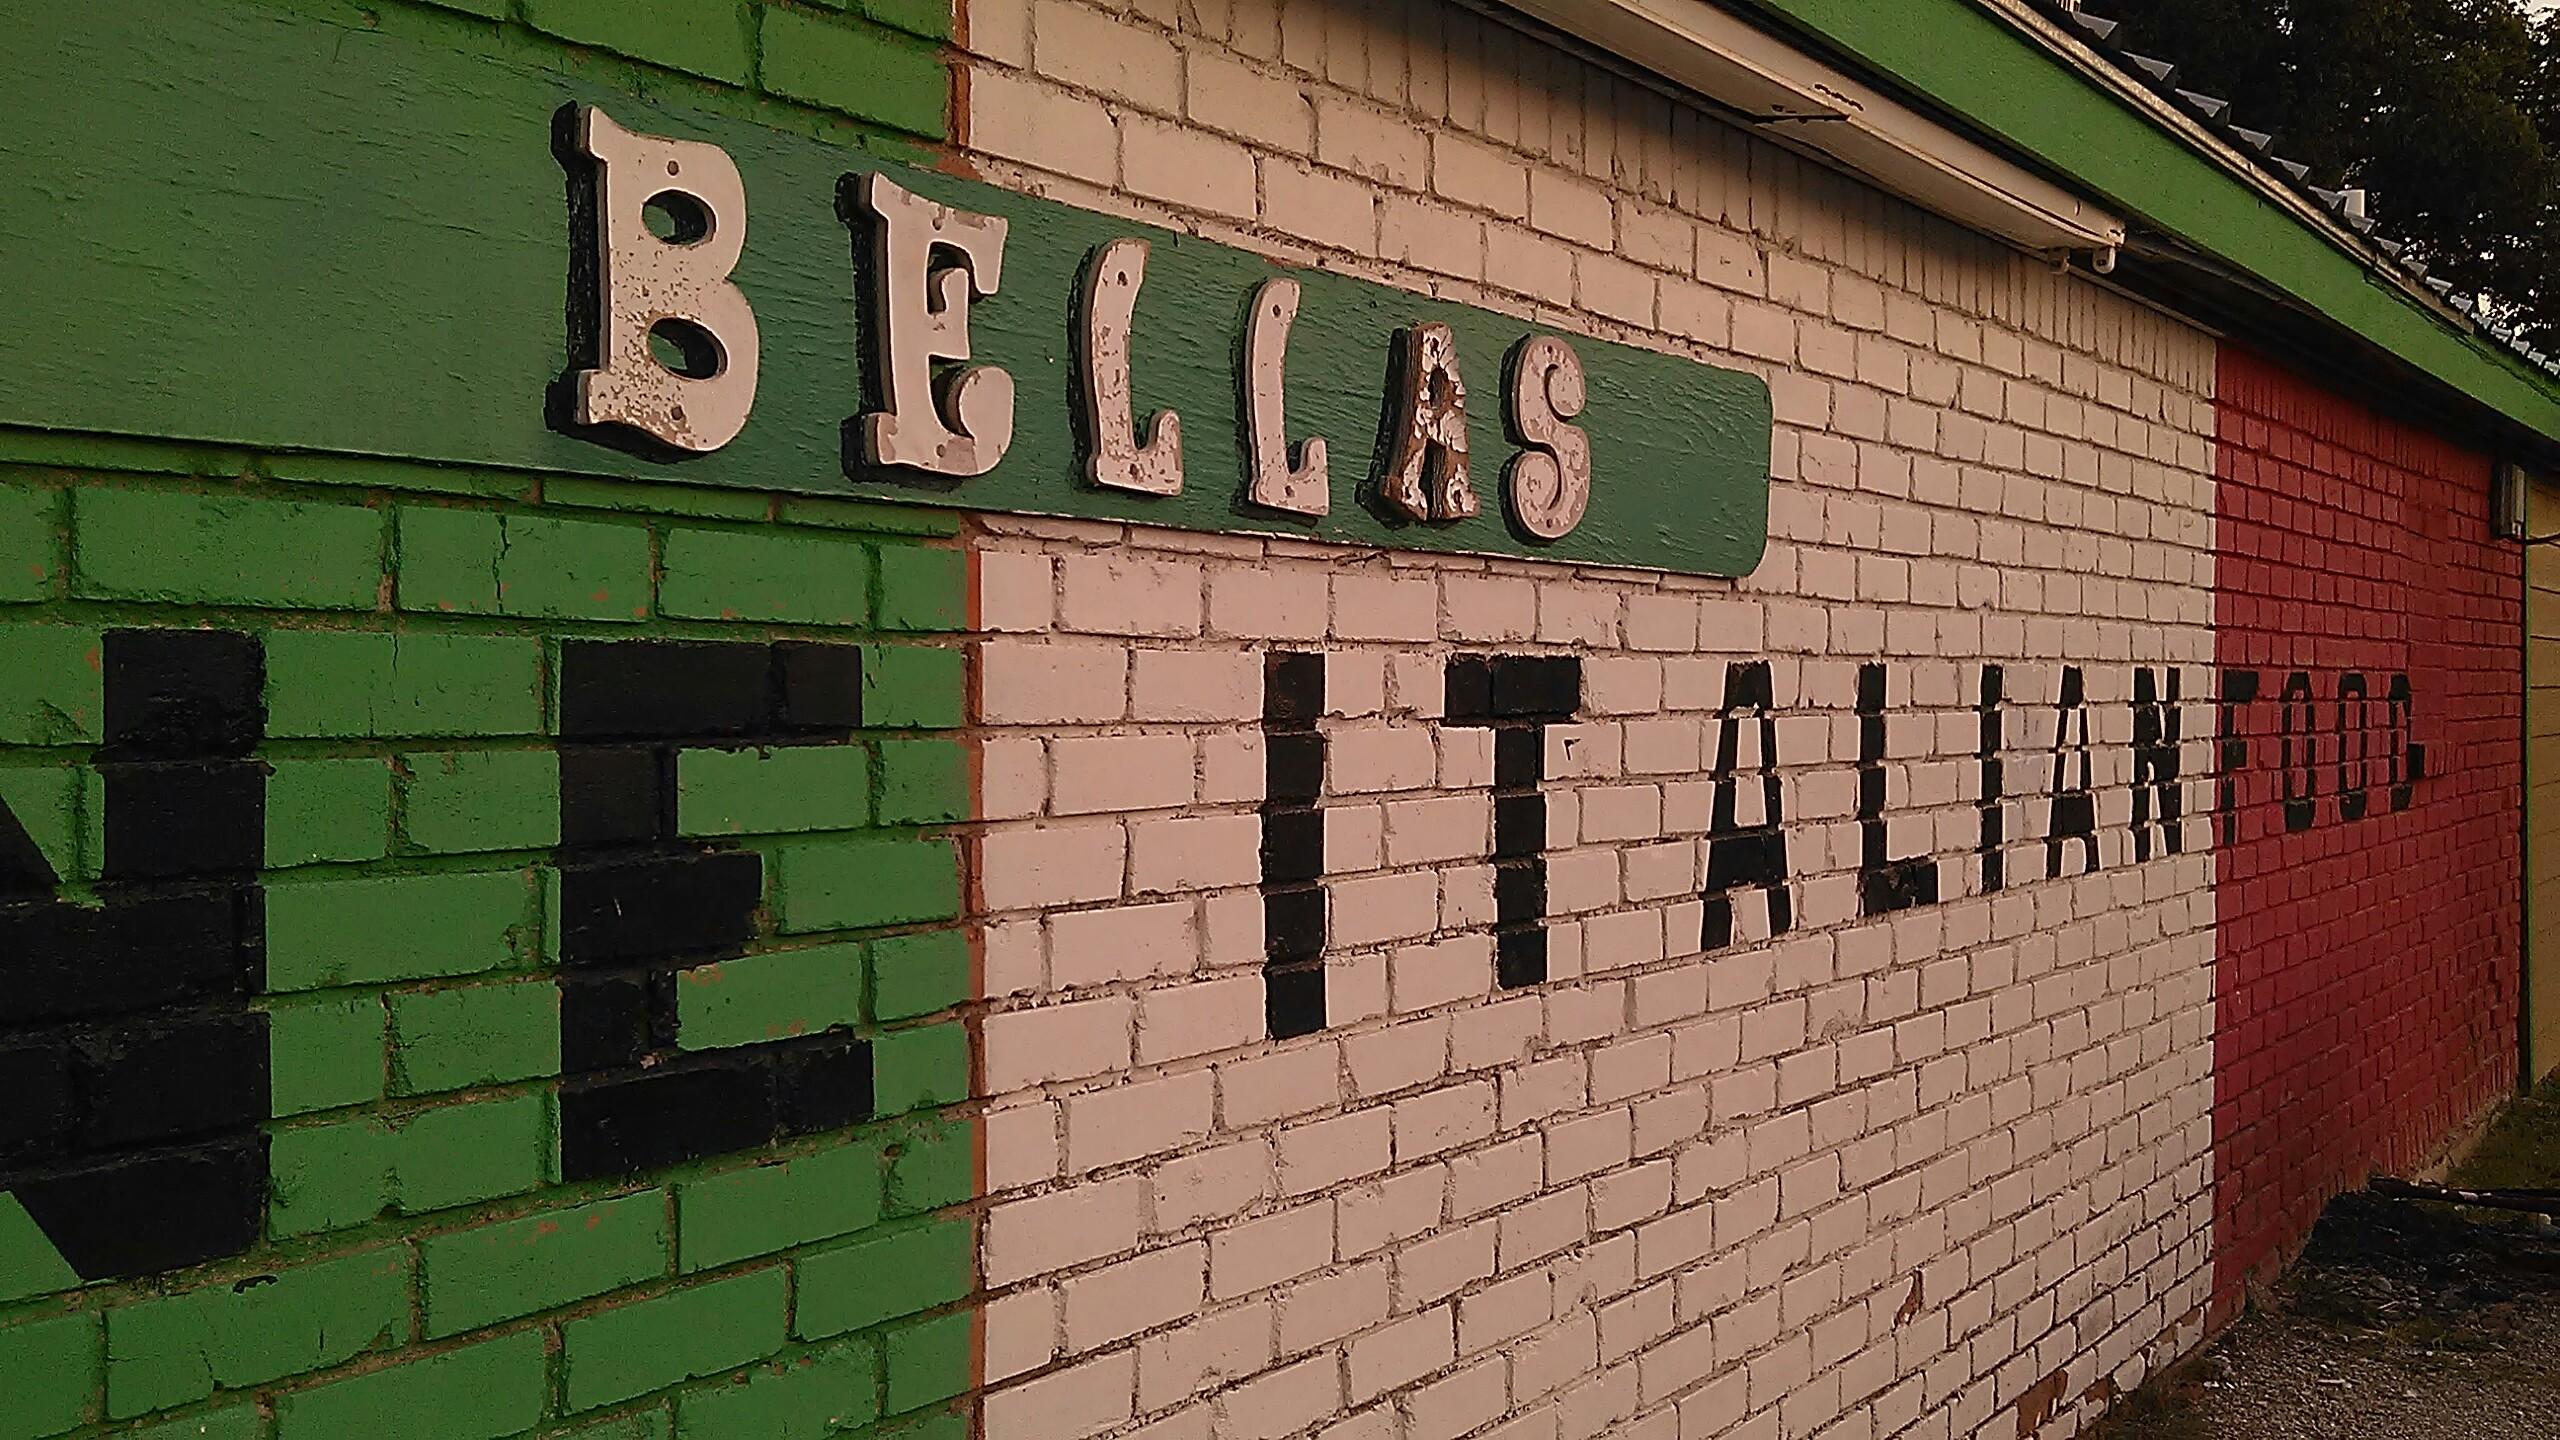 Bellas Italian Restaurant, Bowie TX